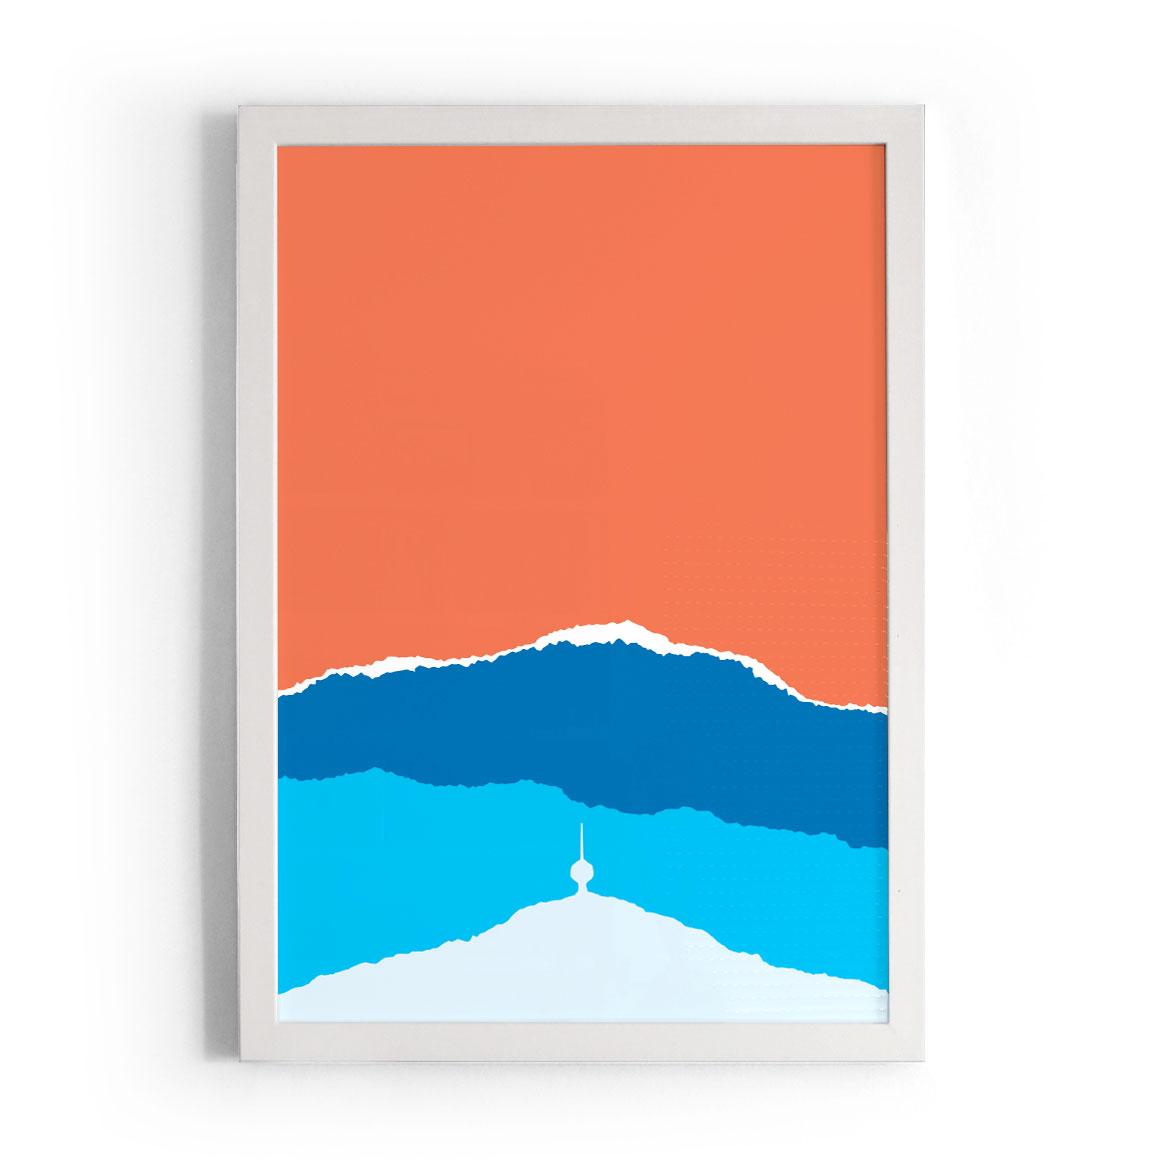 Planine Molimao